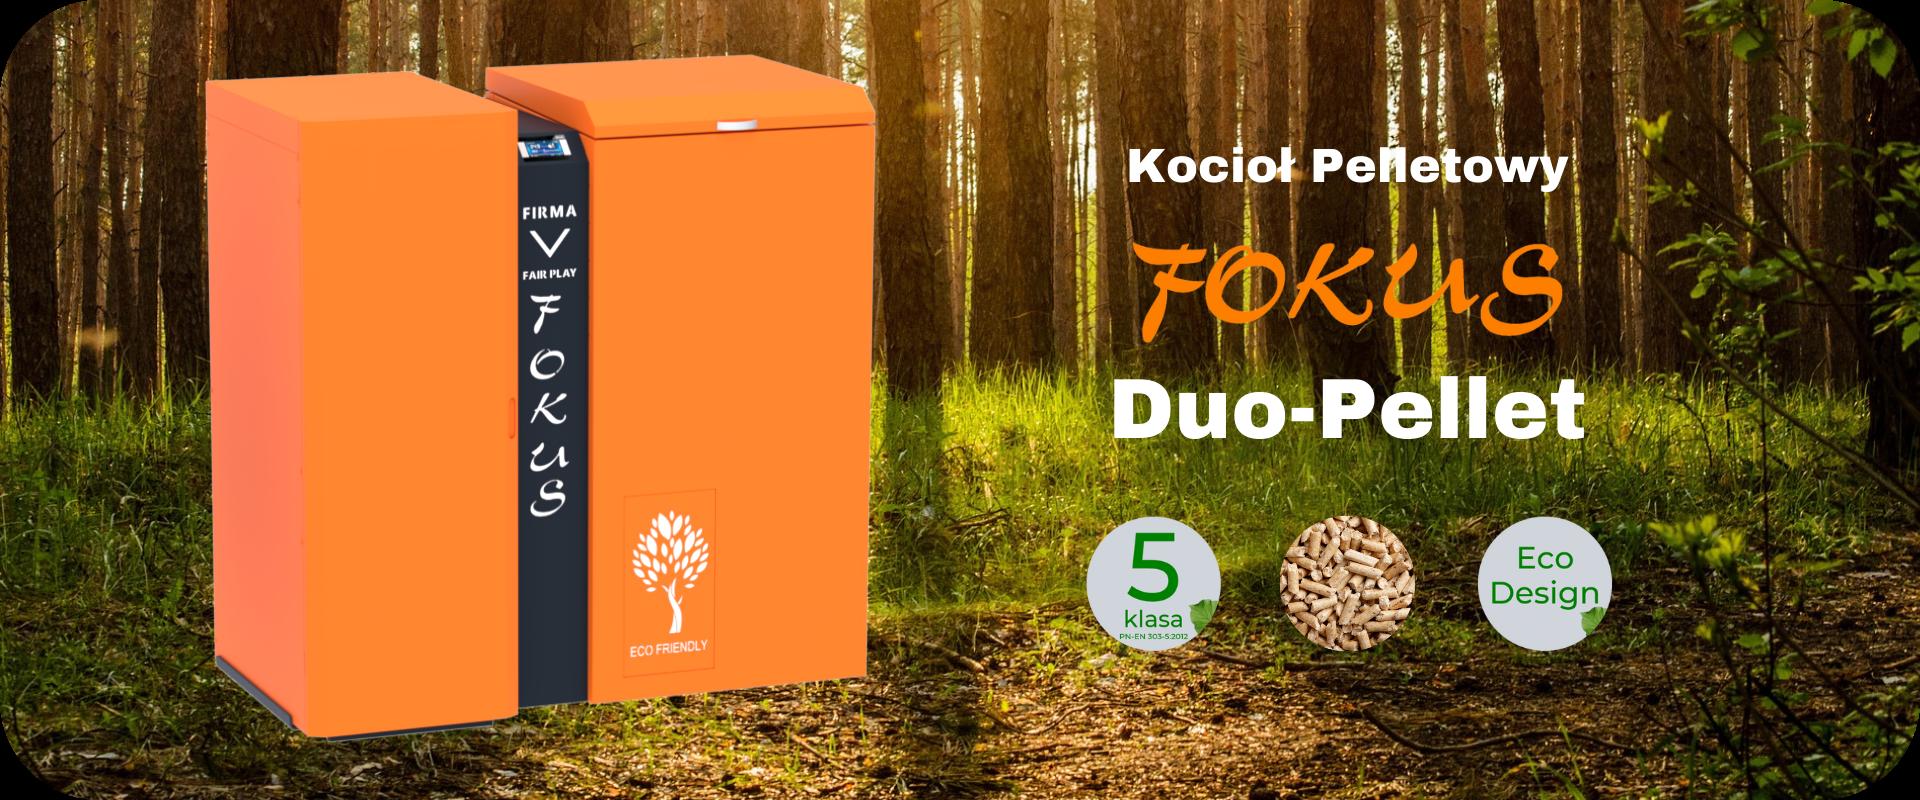 Banner Fokus Duo Pellet Home